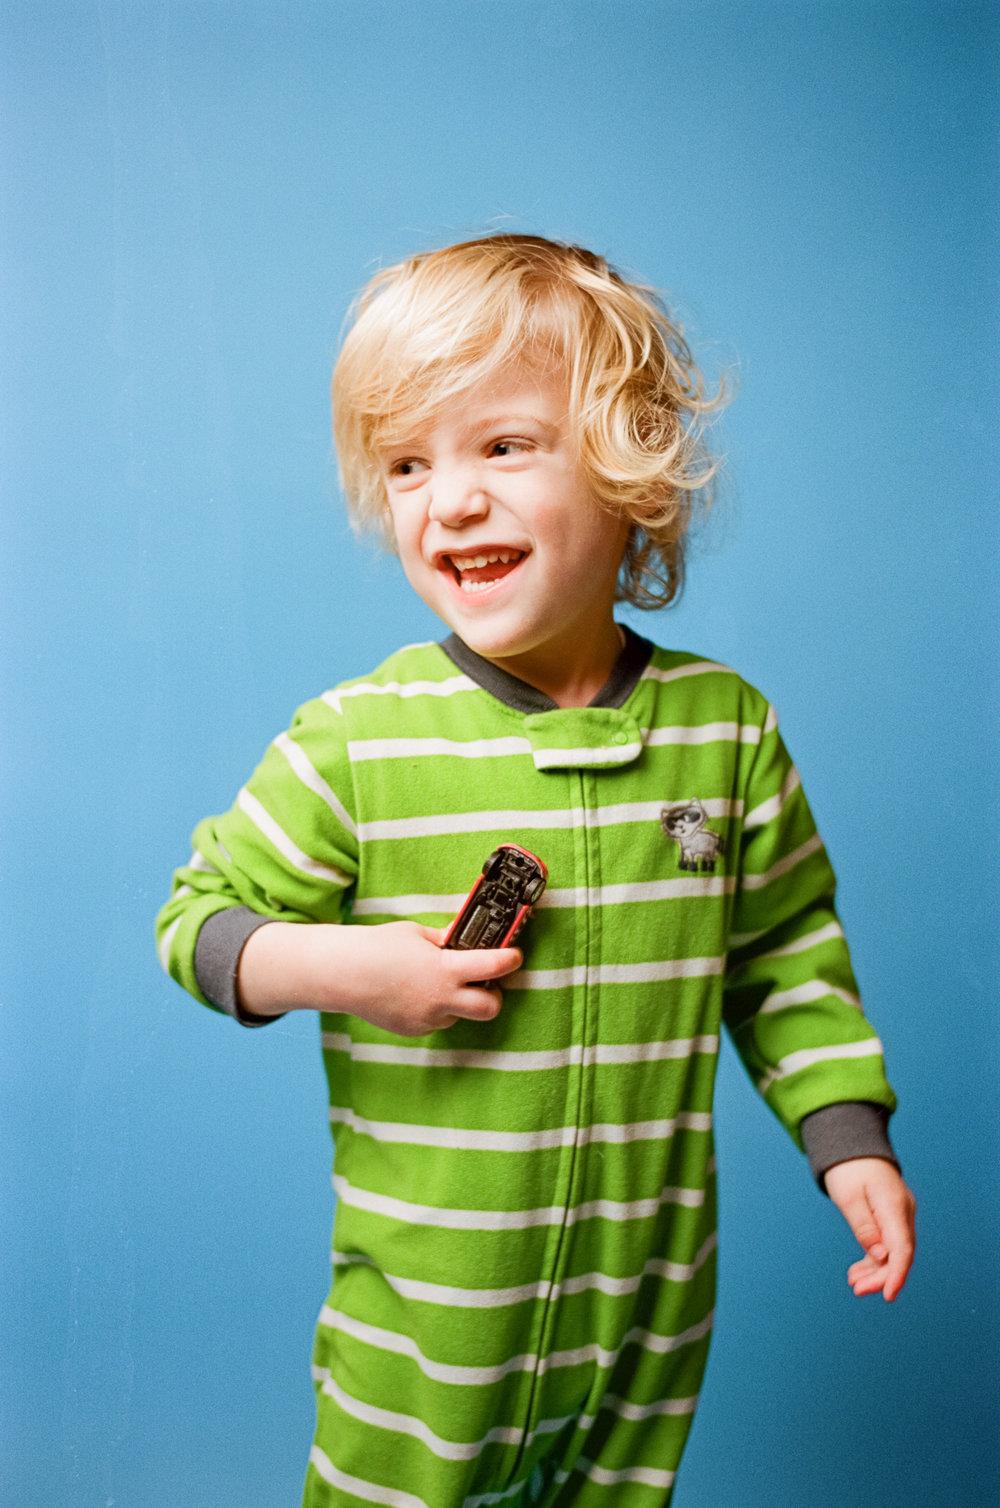 Kids-Photography-Minneapolis-Edina-St-Paul-Photographers-Senior-Families.jpg